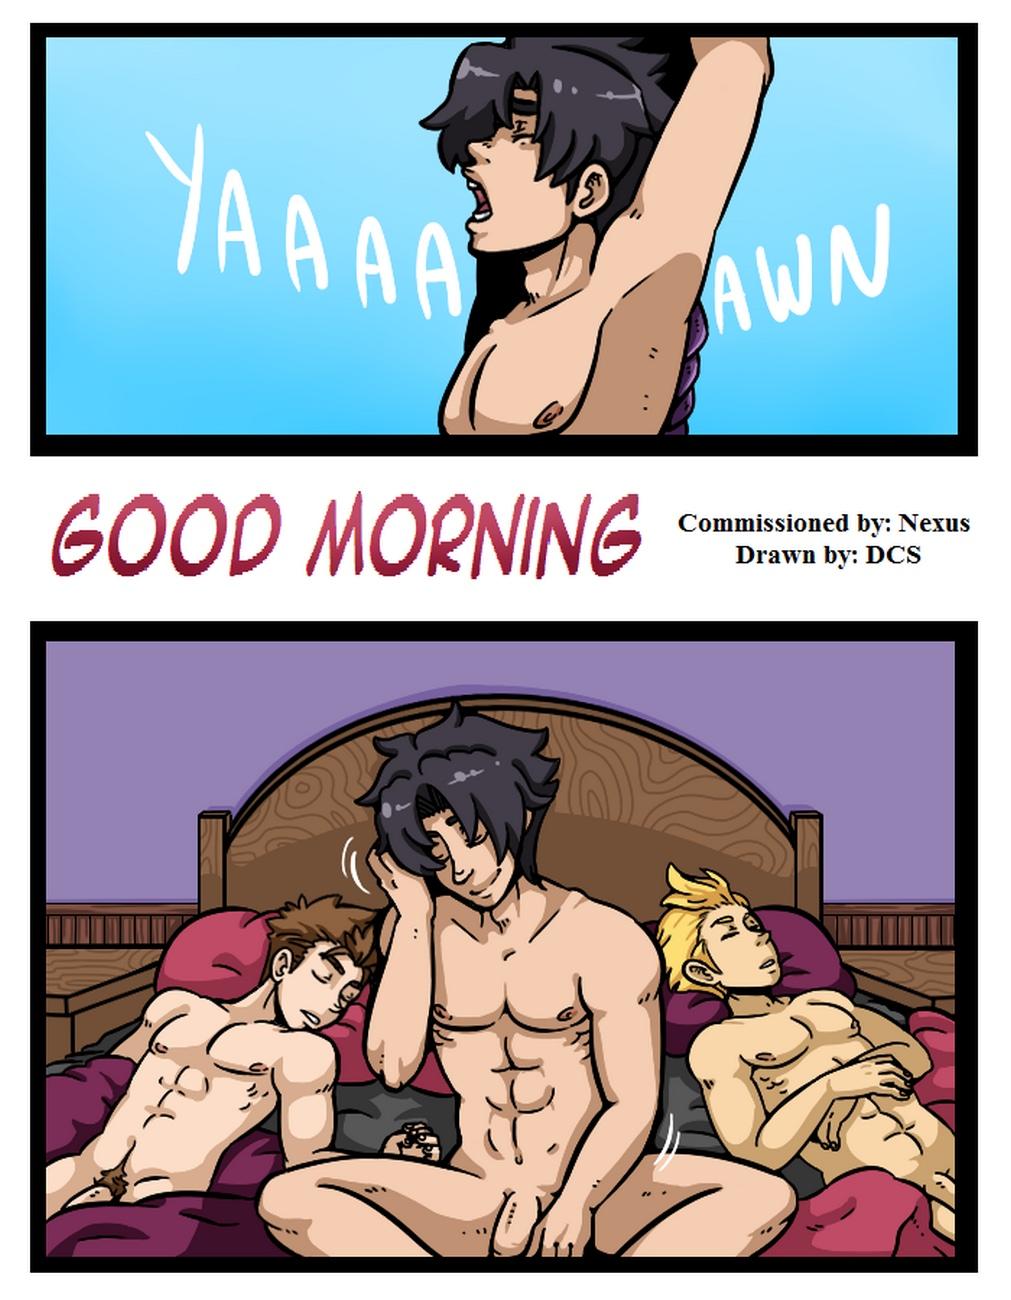 Good-Morning 2 free sex comic